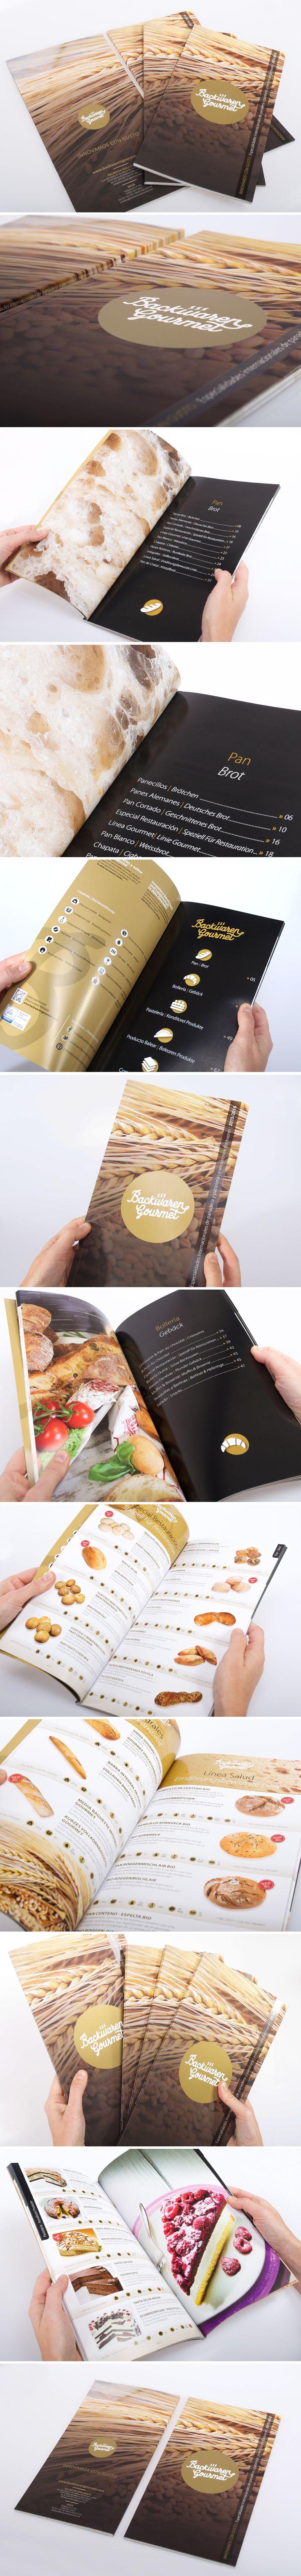 Backwaren Gourmet es una empresa ubicada en Mallorca que distribuye productos…